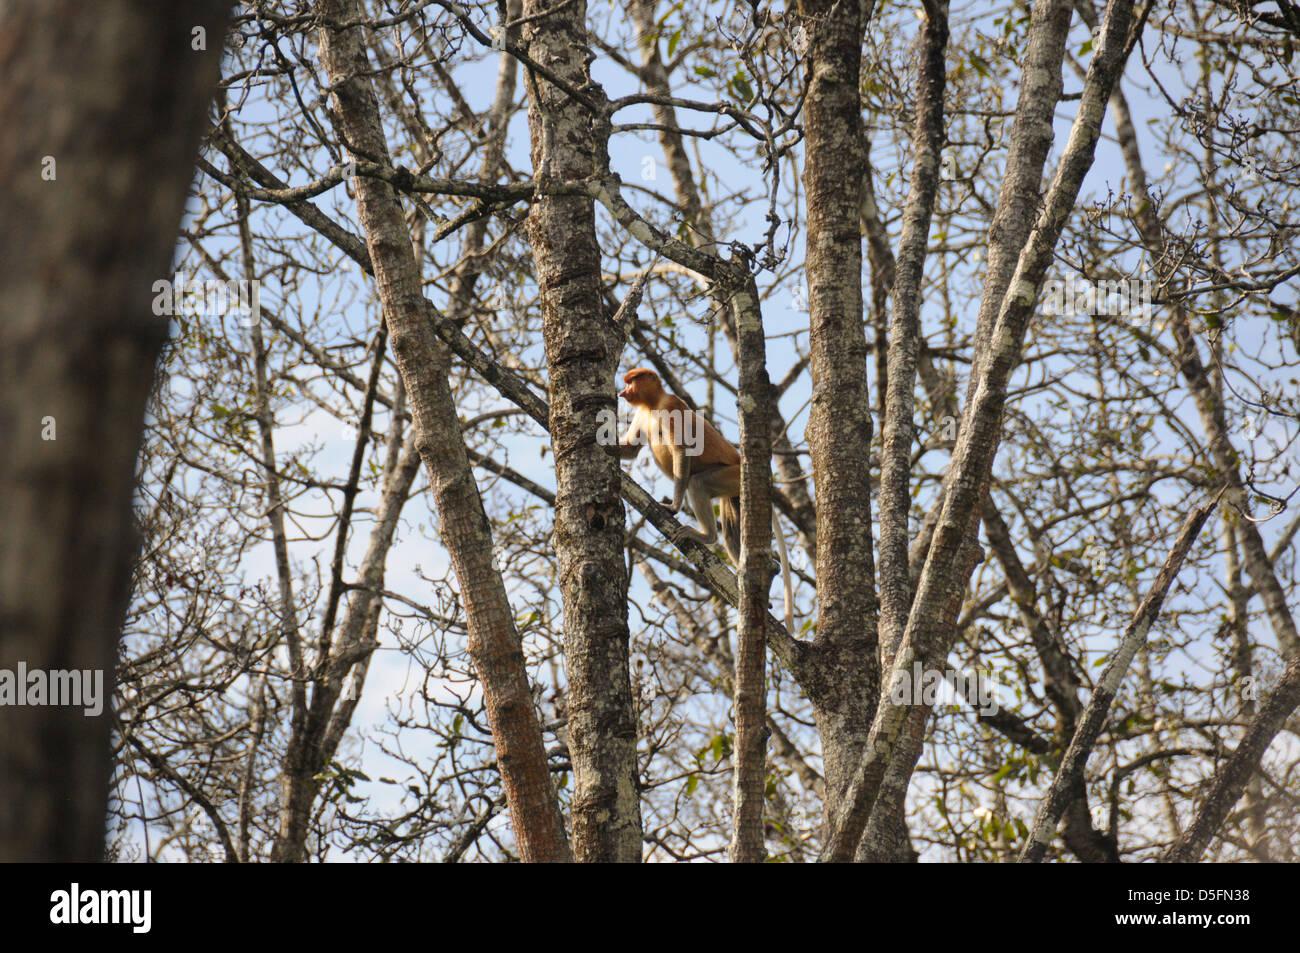 Proboscis monkeys (long-nosed monkey) in the trees near Brunei Capital Bandar Seri Begawan, - Stock Image